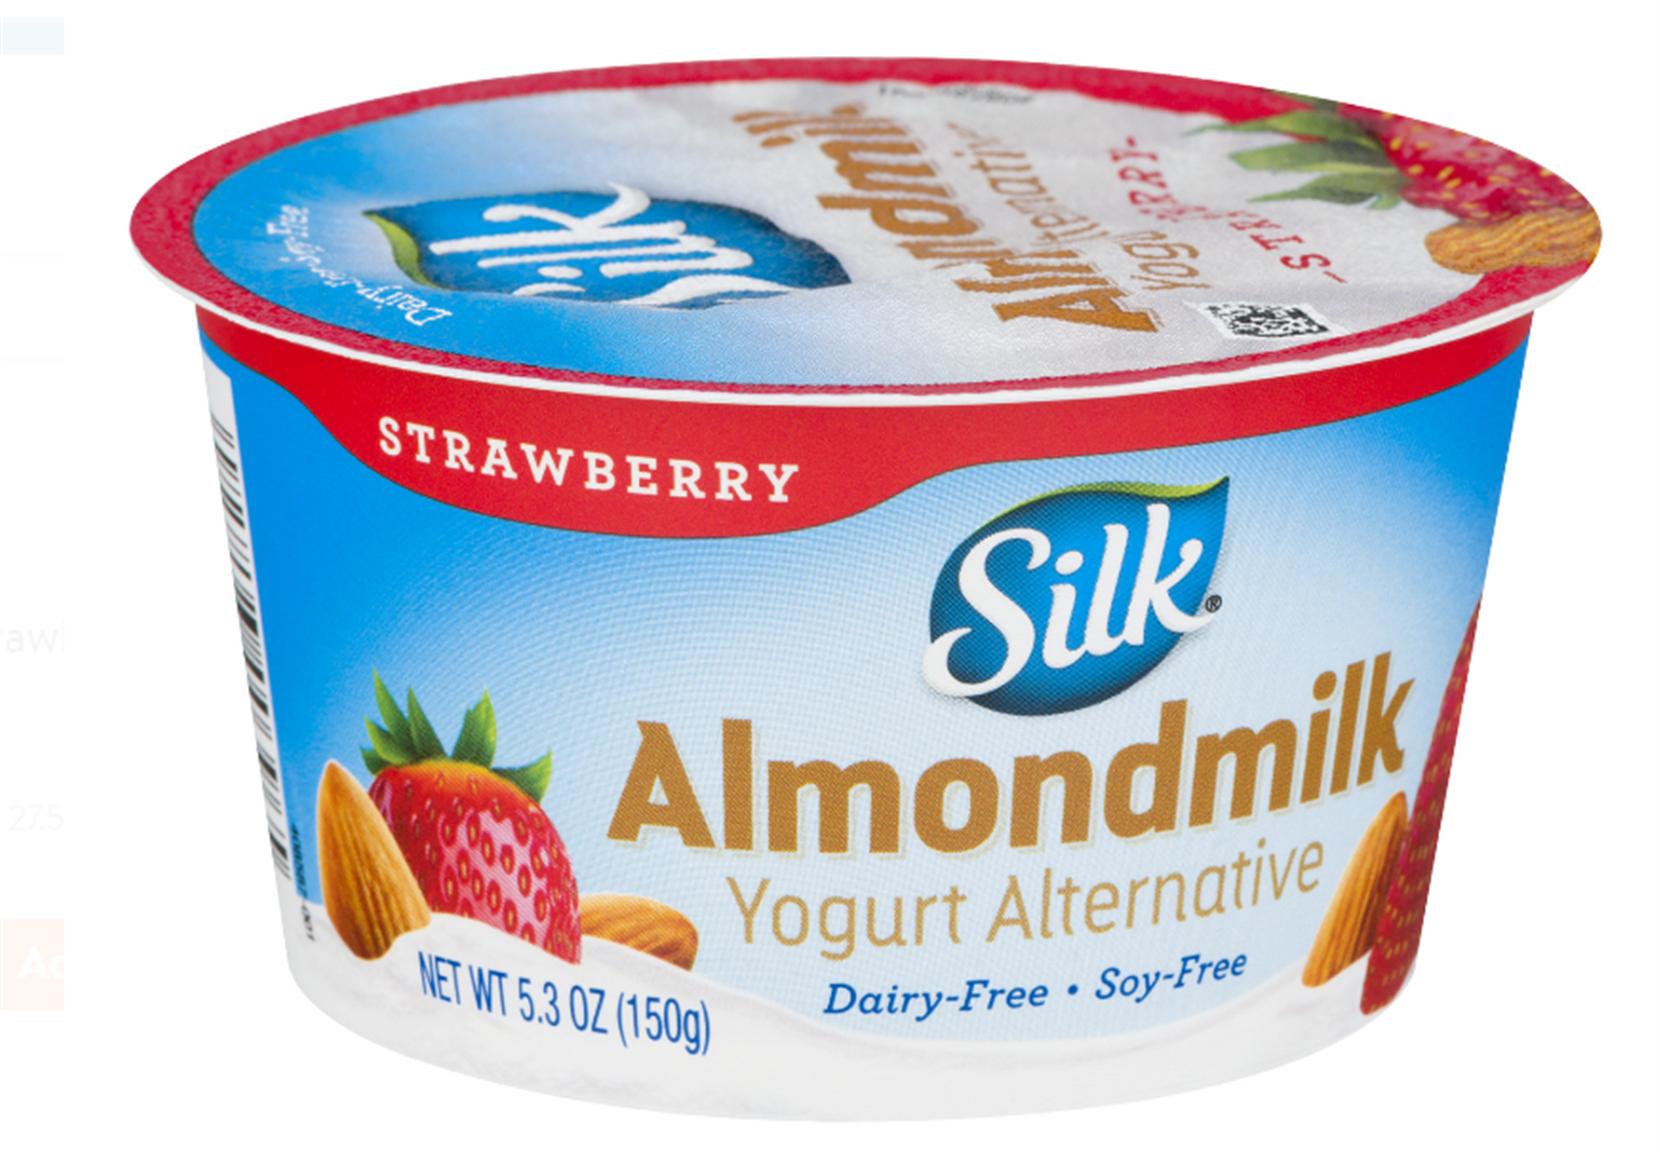 Publix – Silk AlmondMilk Yogurt Only 25¢ each! Starting 2/20!